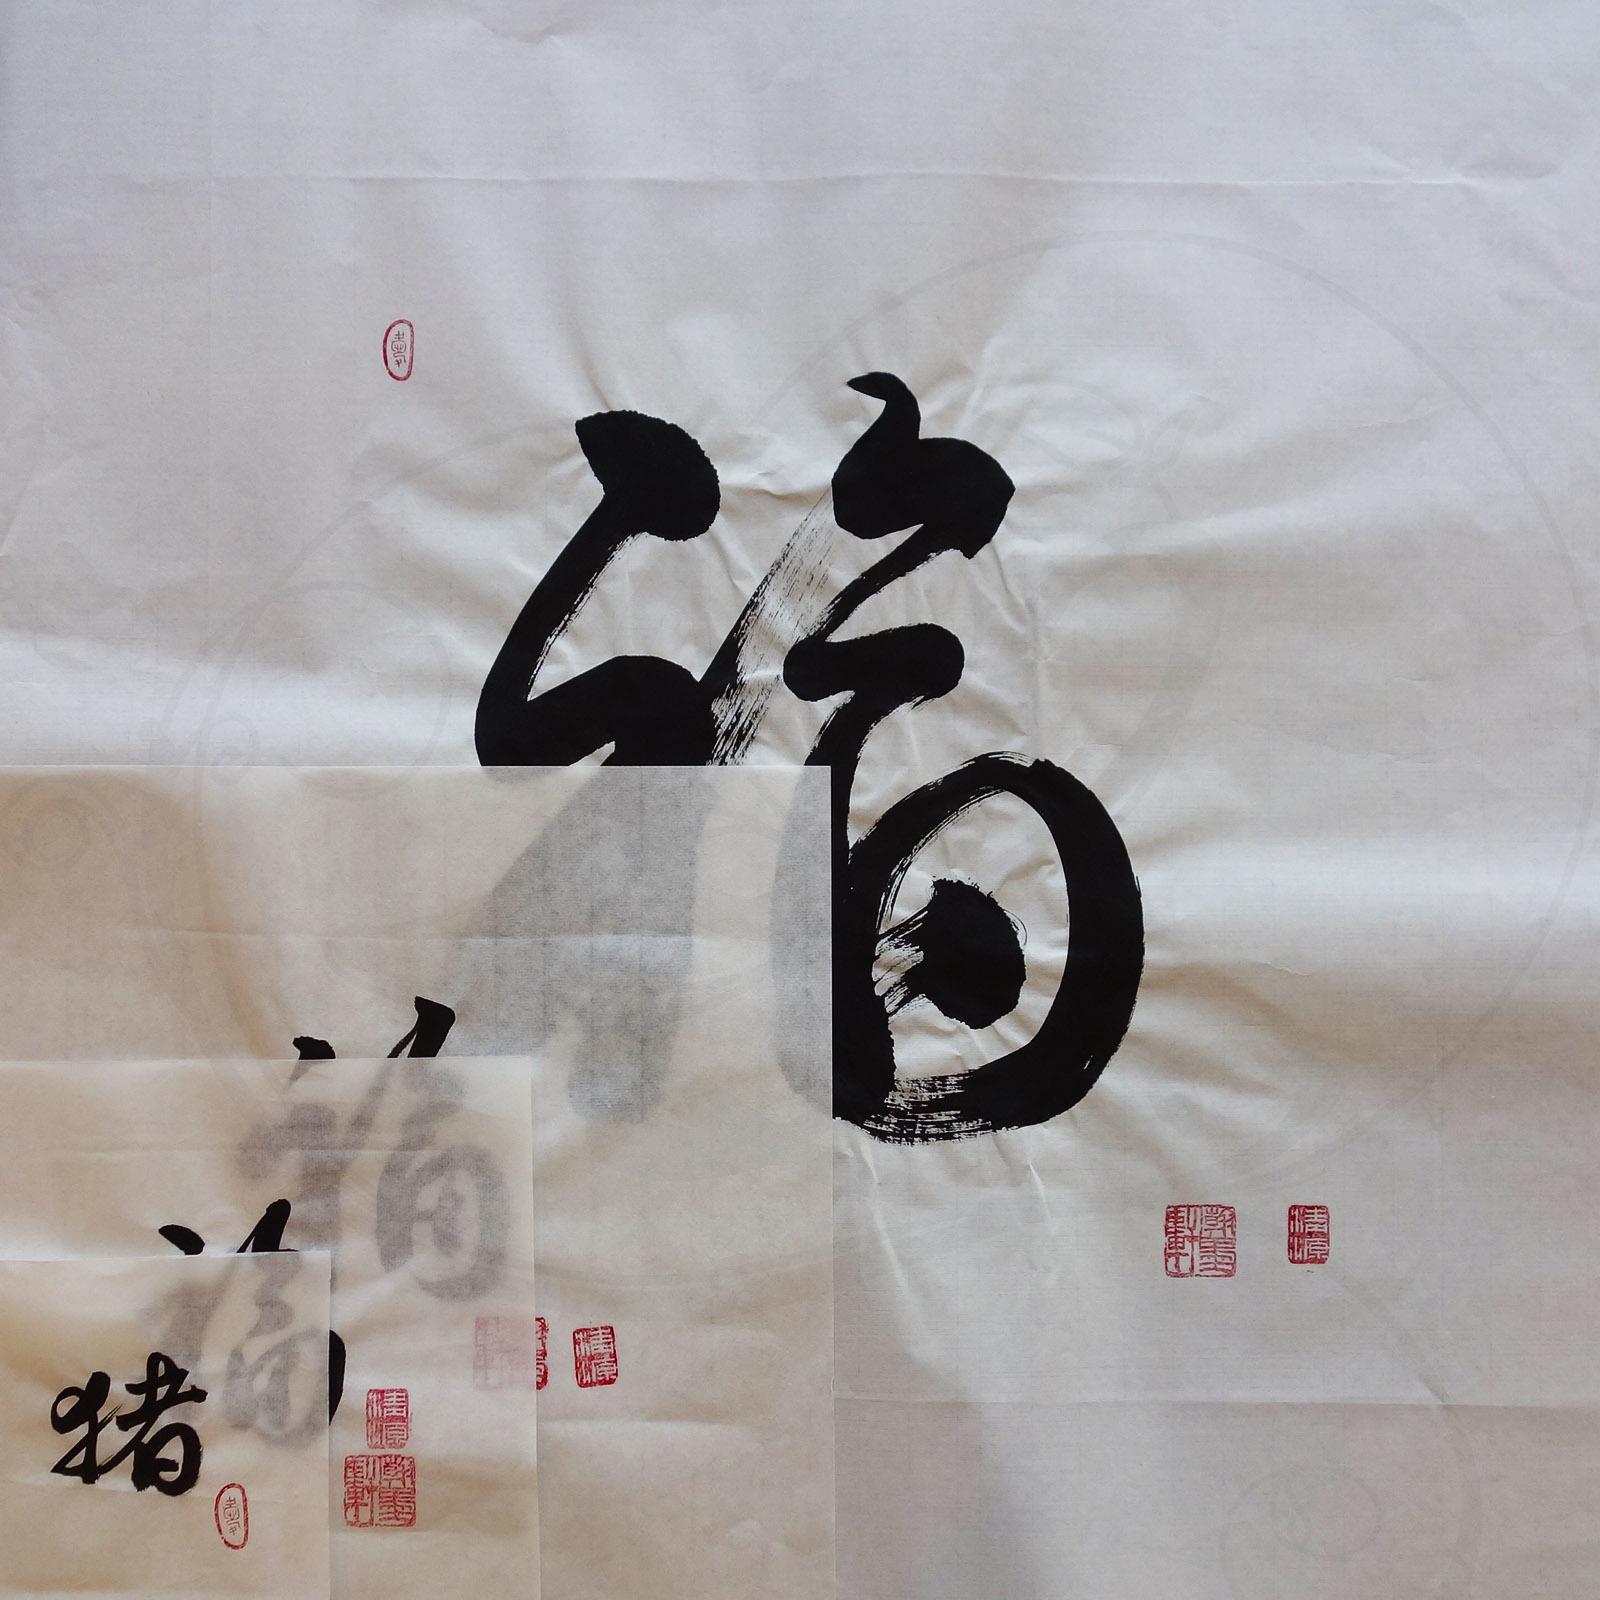 calligraphie-chinoise-vertus-xing-shu-bonheur-tous-formats